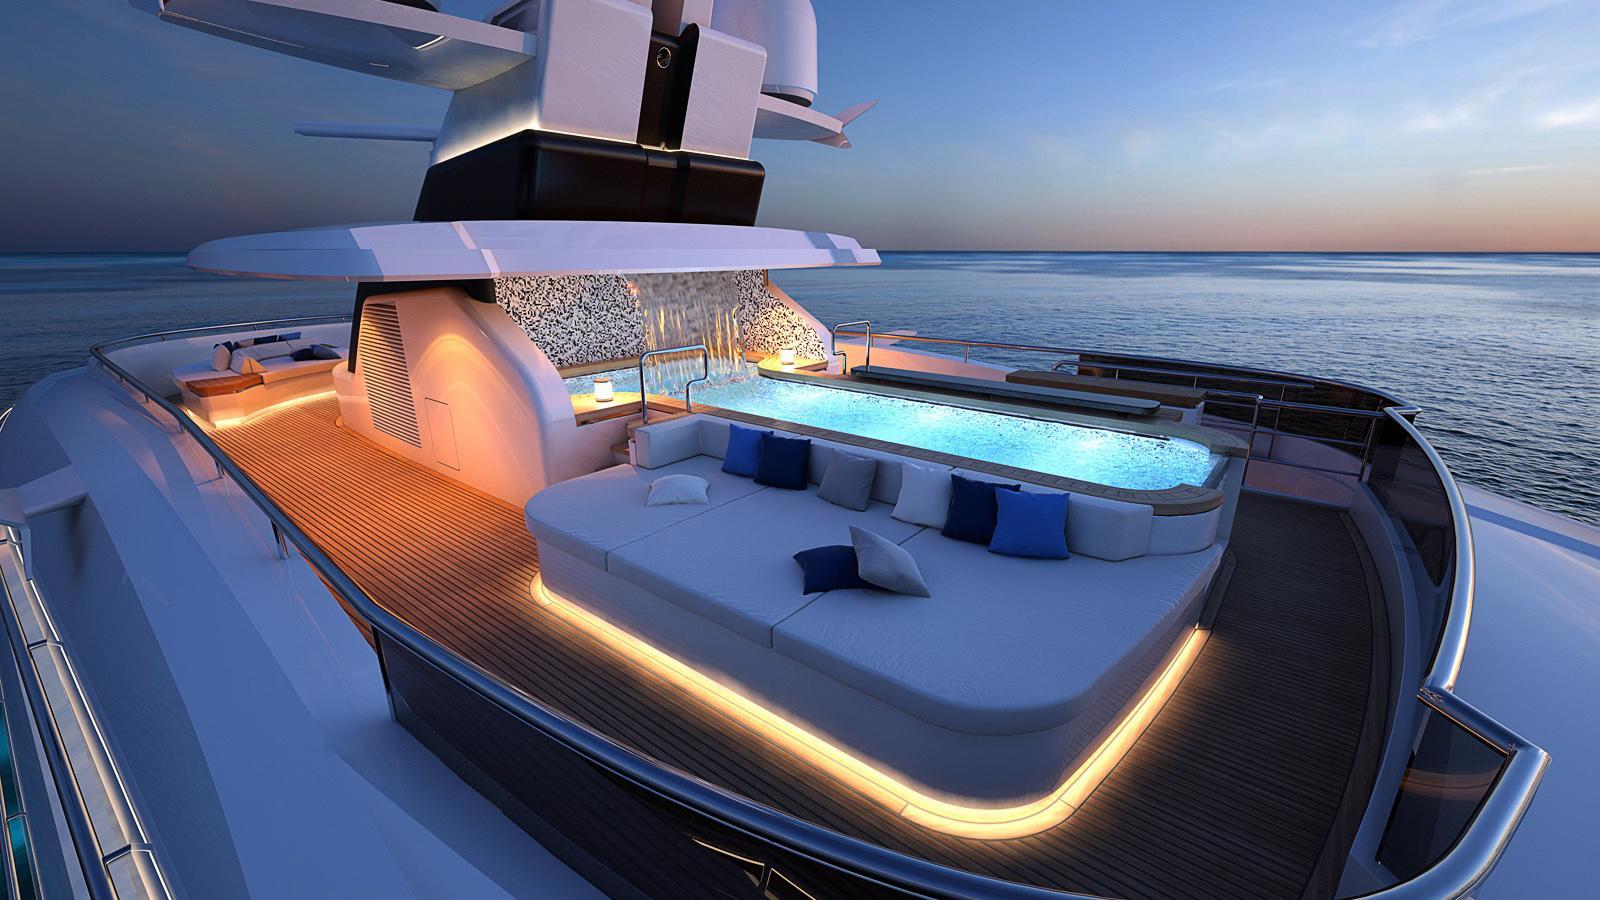 columbus classic 80m motoryacht palumbo 80m 2018 rendering sundeck